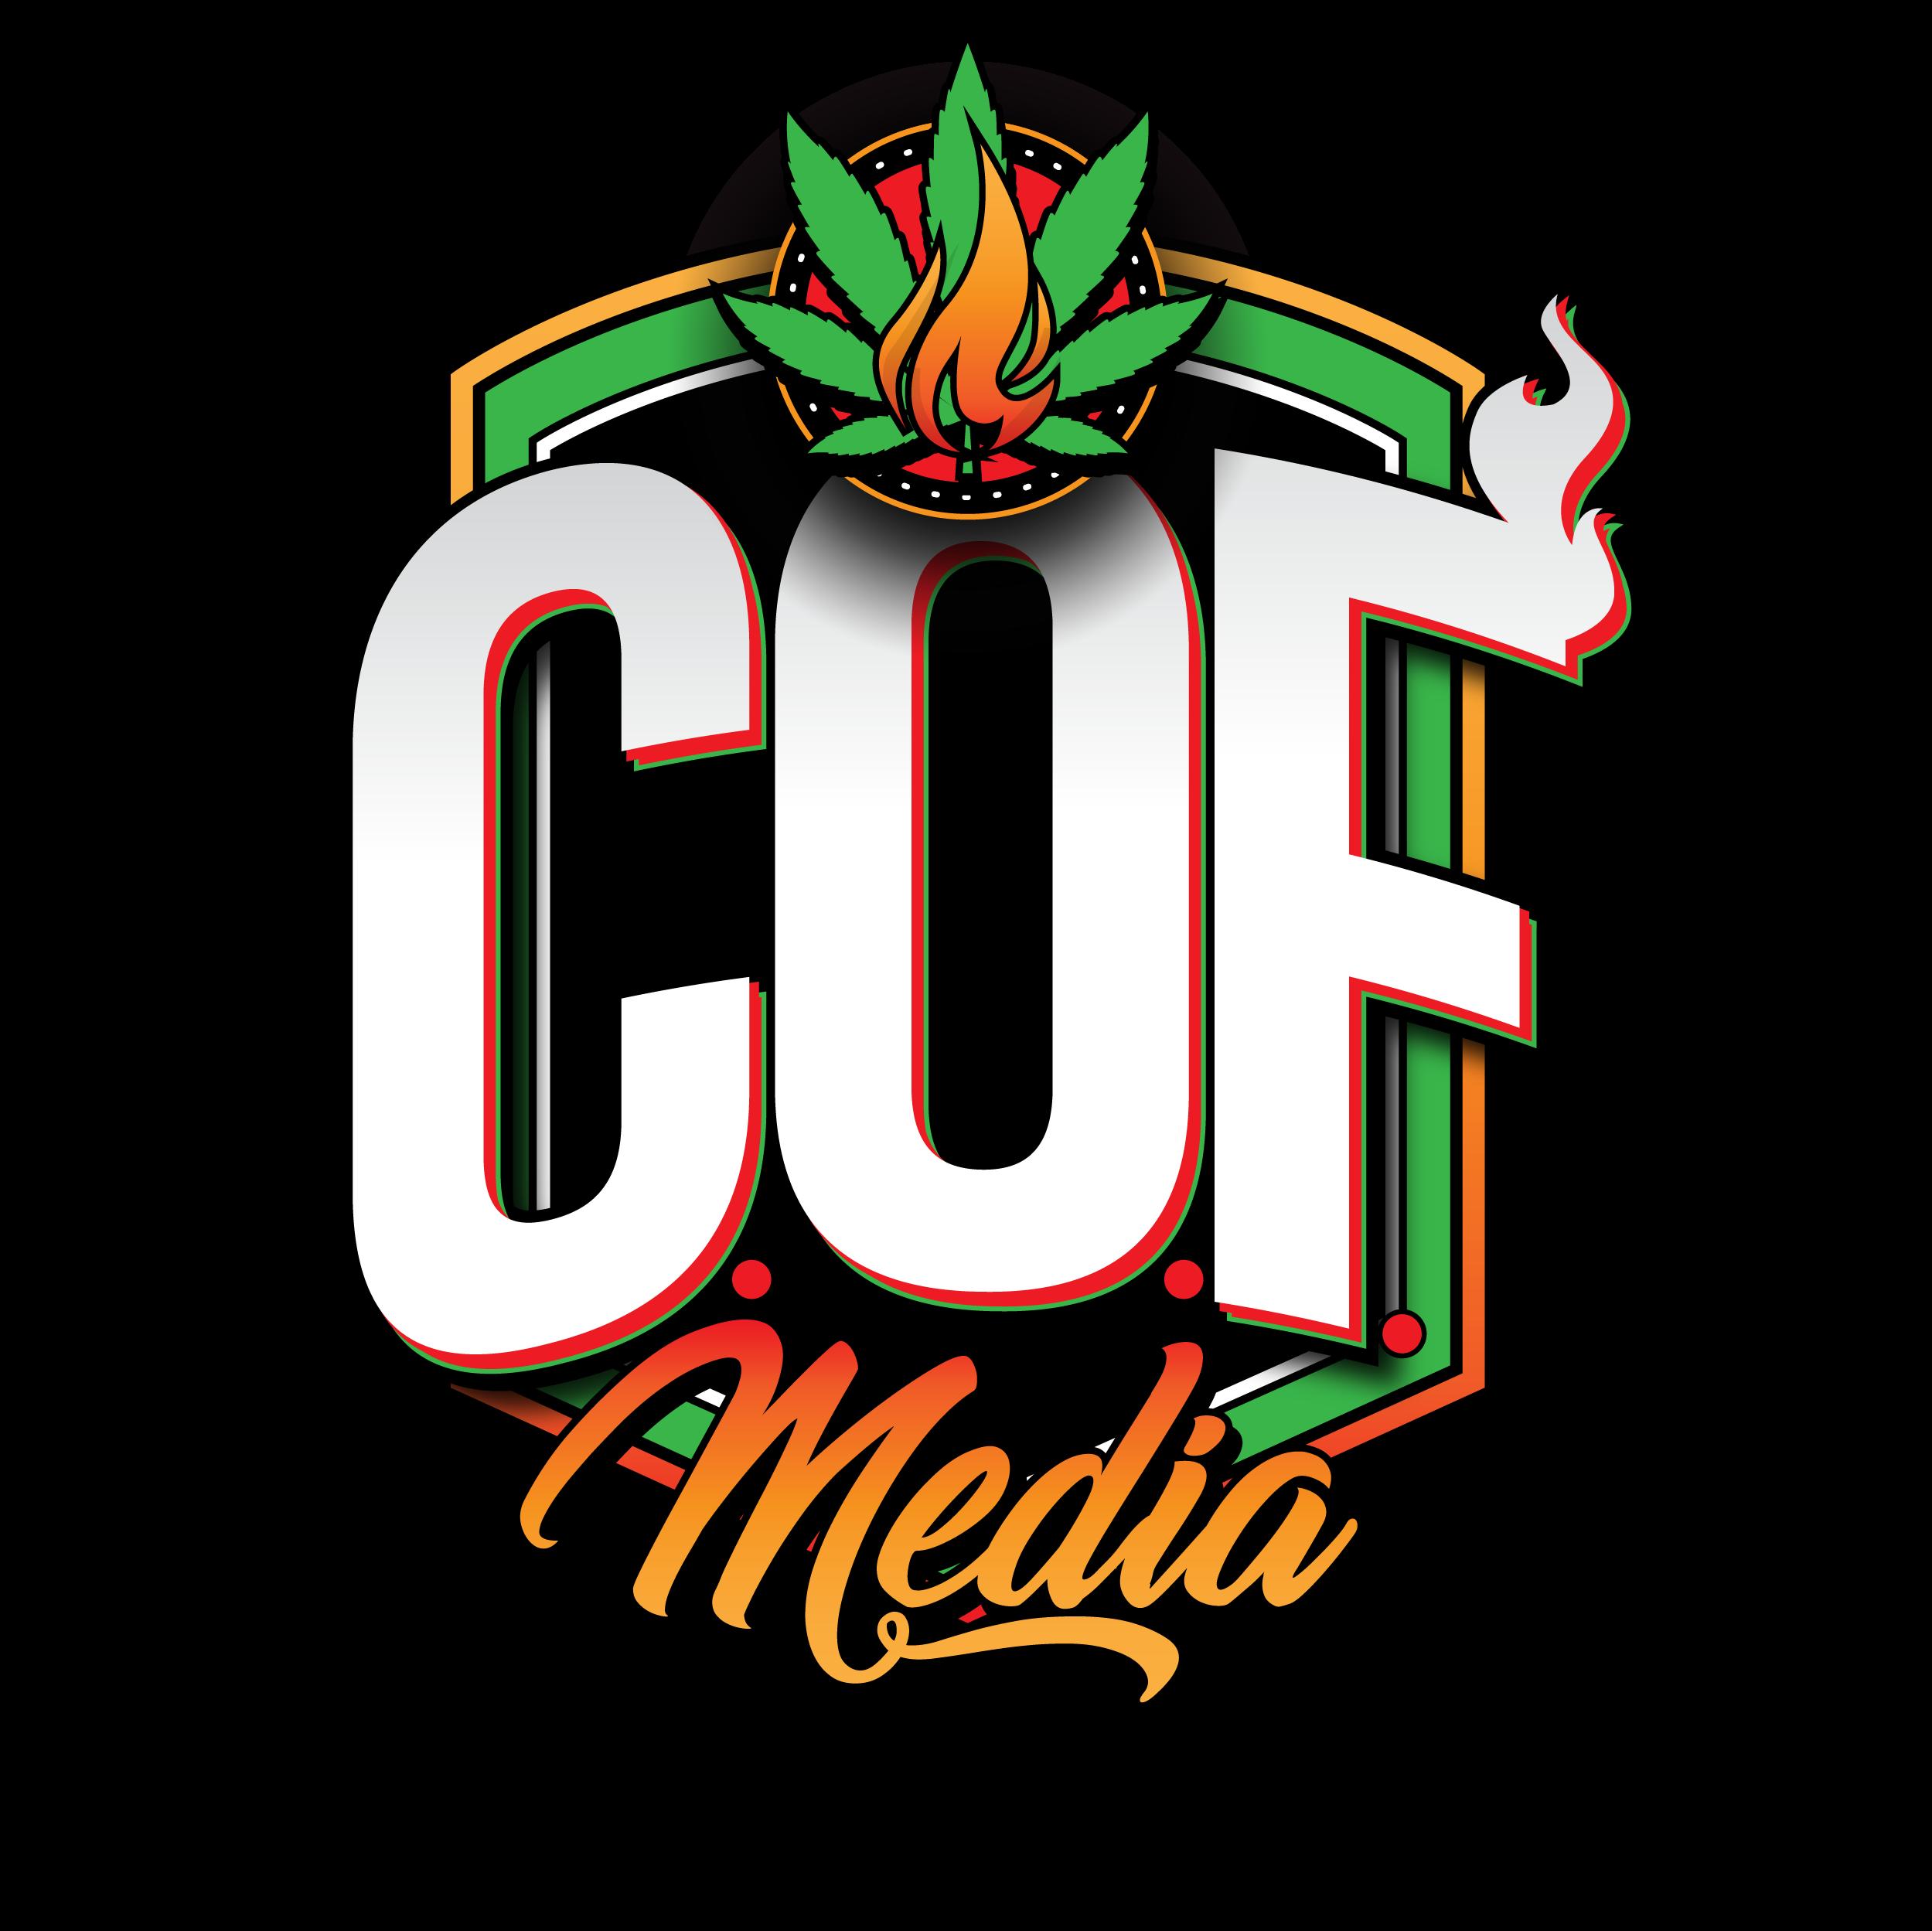 Clones On Fire Media